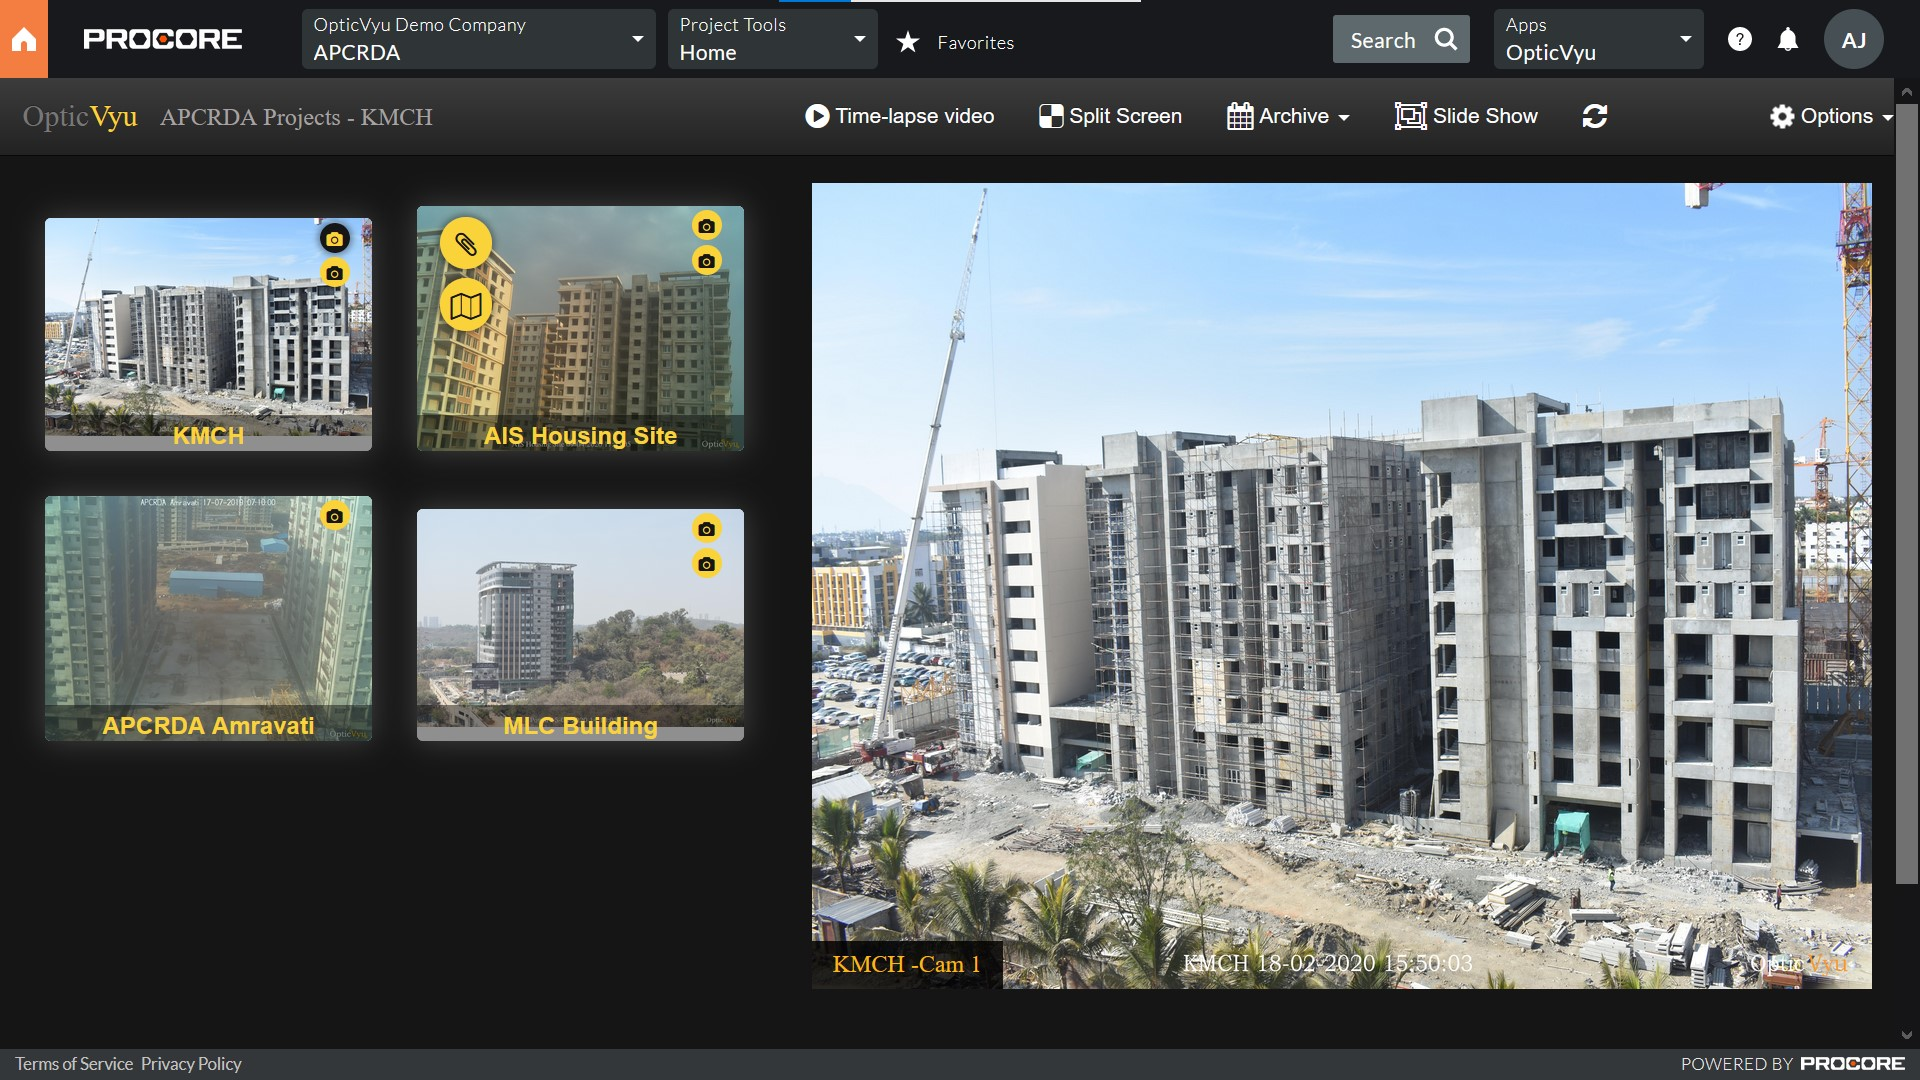 opticvyu embedded app procore integration